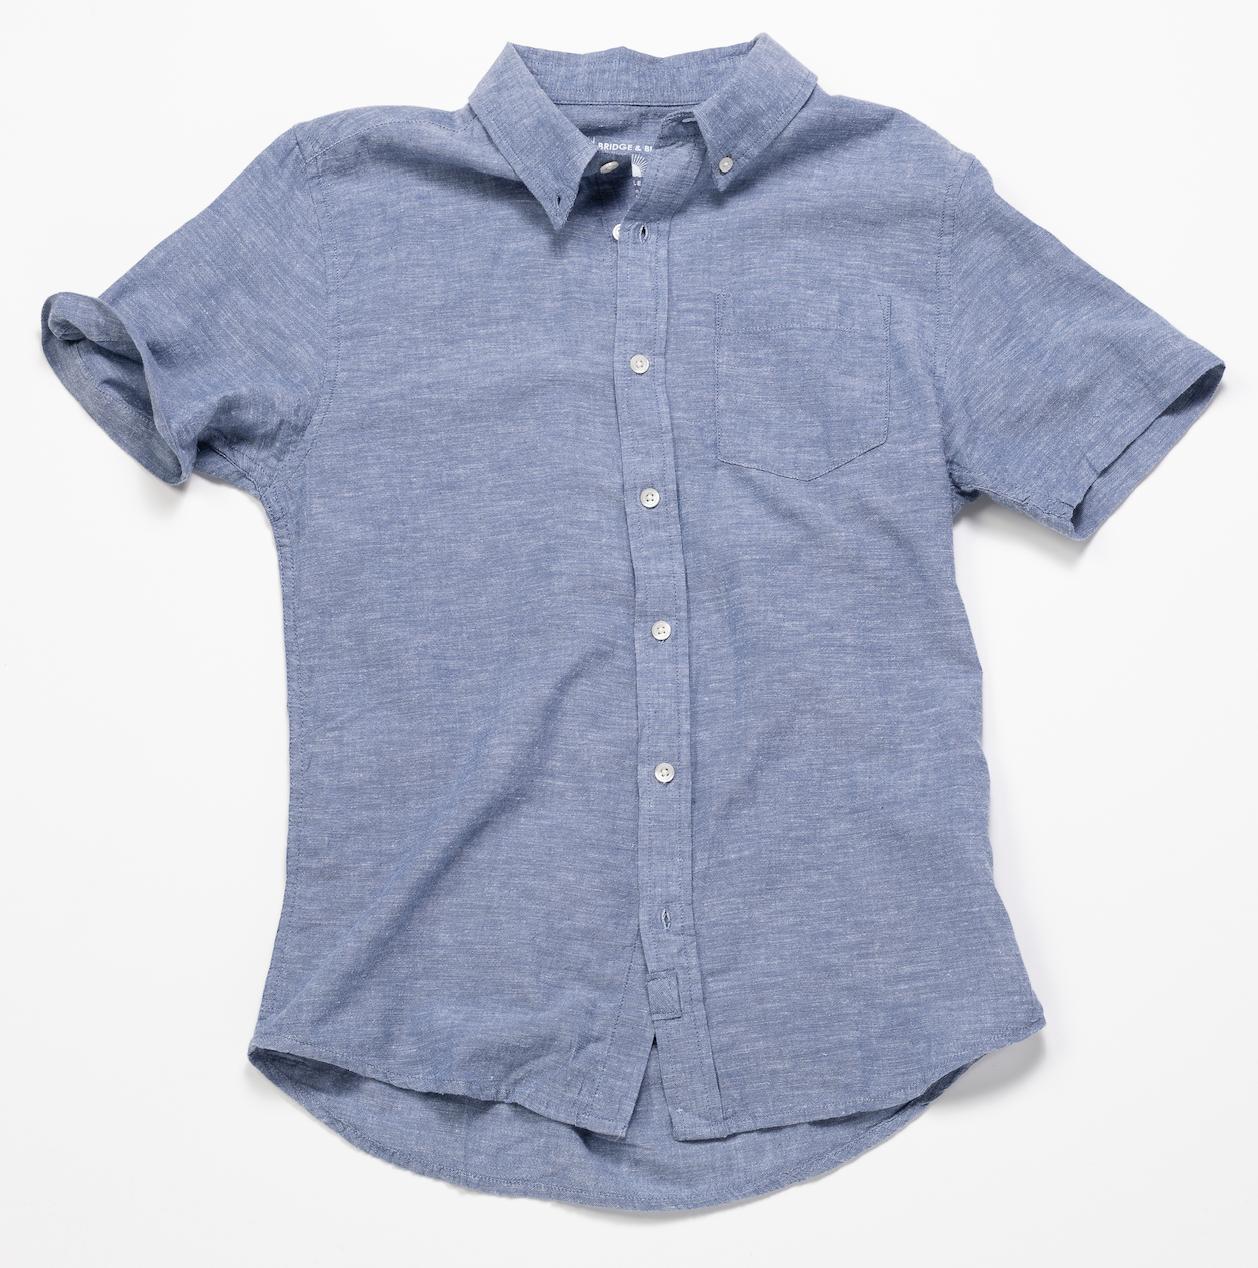 Short Sleeve Chambray Shirt – Light Indigo